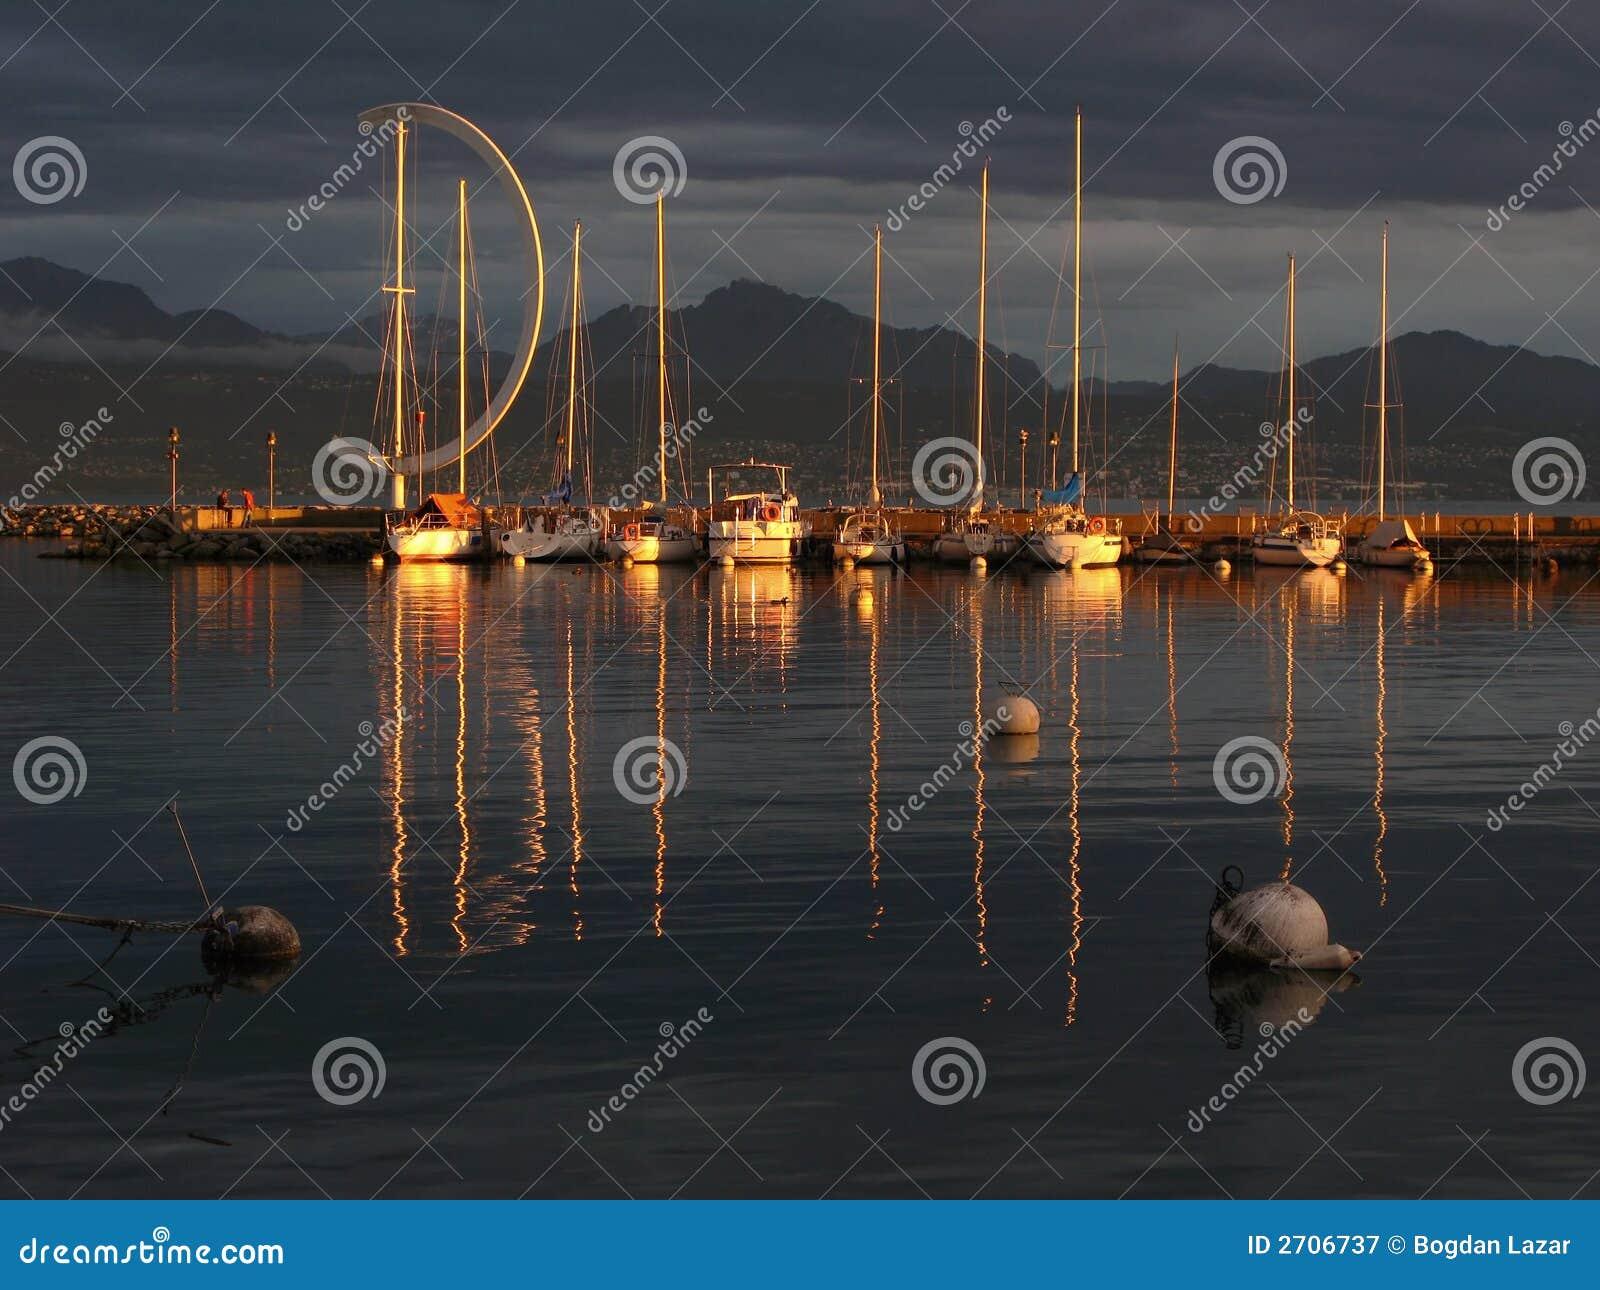 Sunset on Lake Geneva in Lausanne, Switzerland